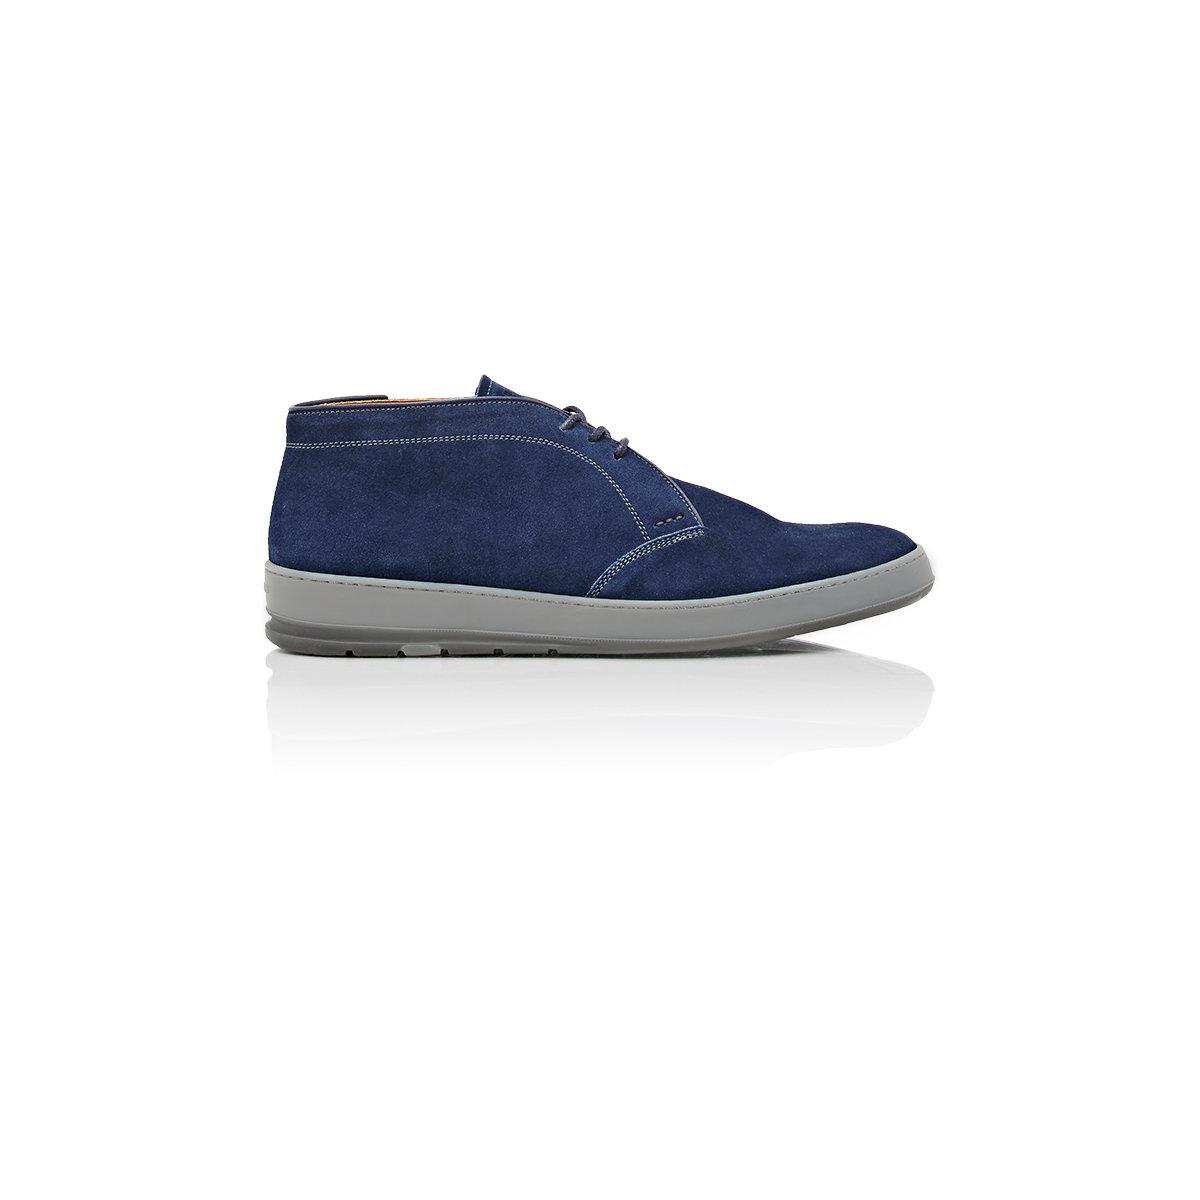 Lyst Heschung Zack Chukka Sneakers In Blue For Men